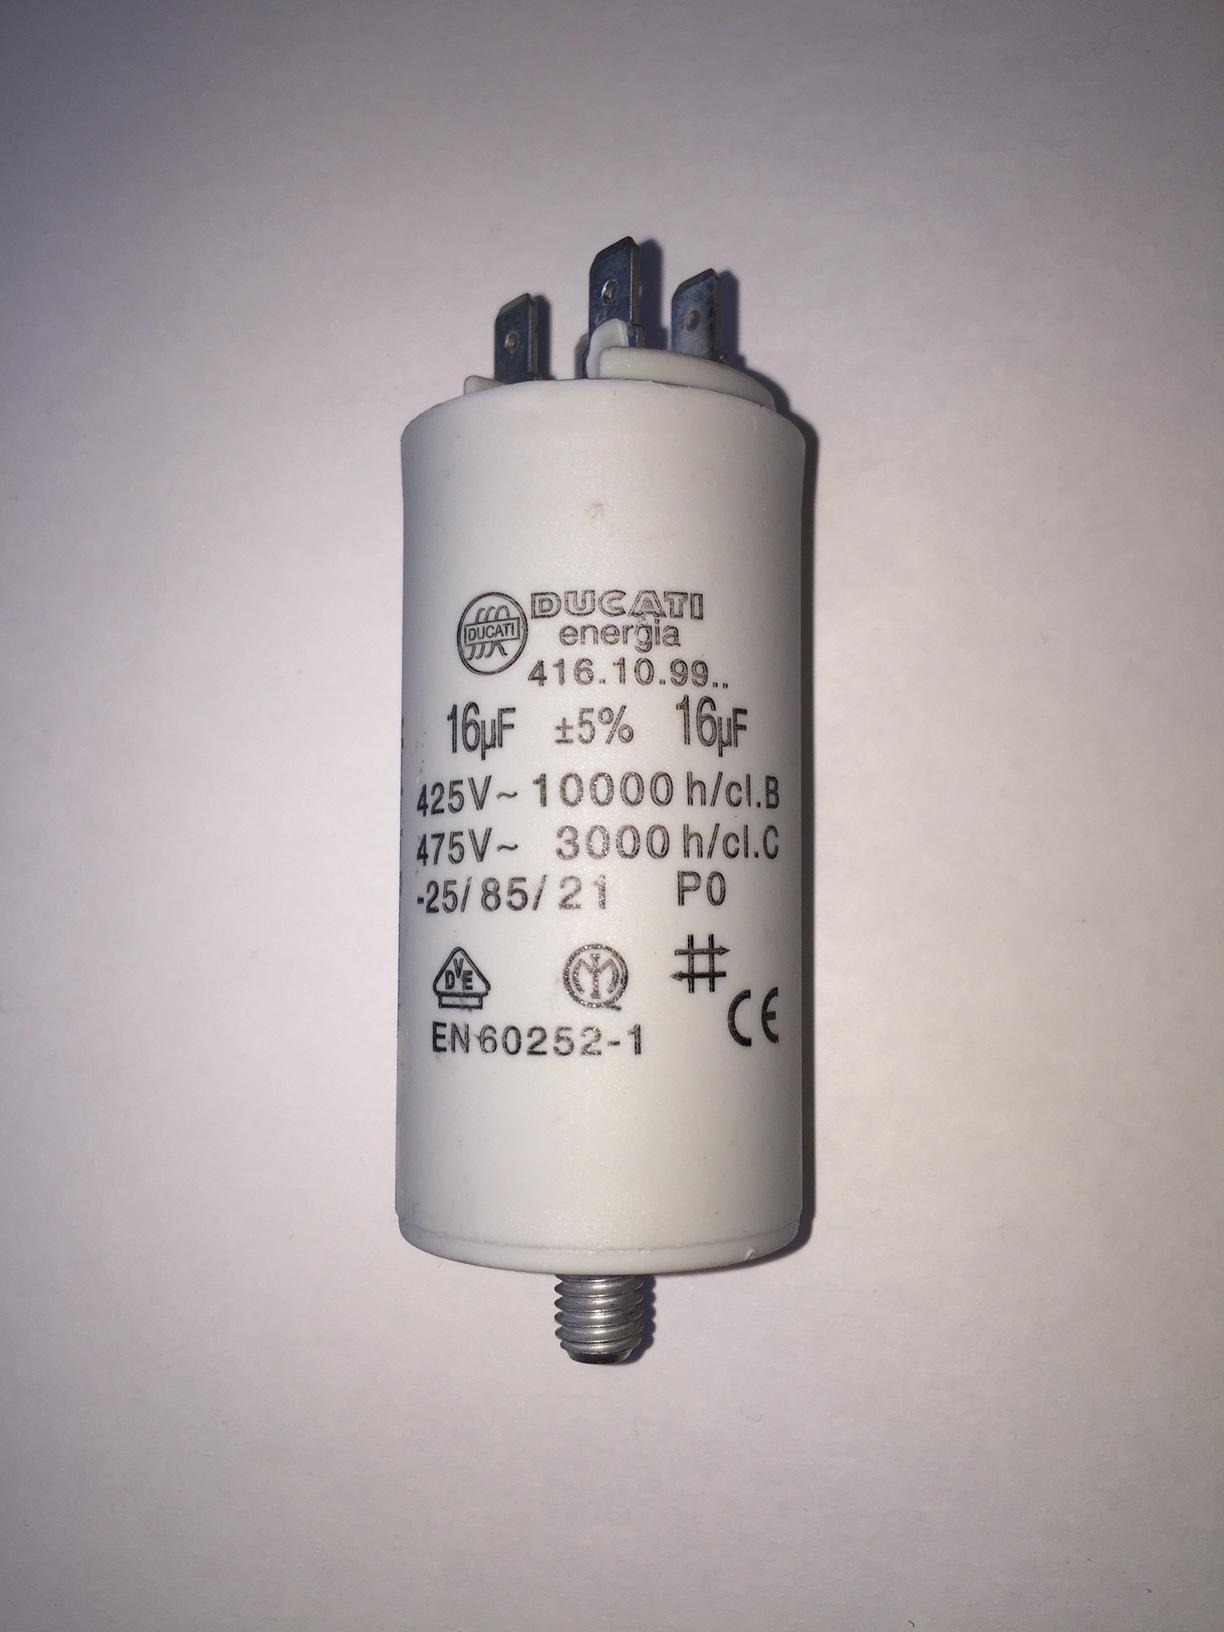 Buy motor run capacitors 16uf buy now get next day delivery for Ducati energia motor run capacitor